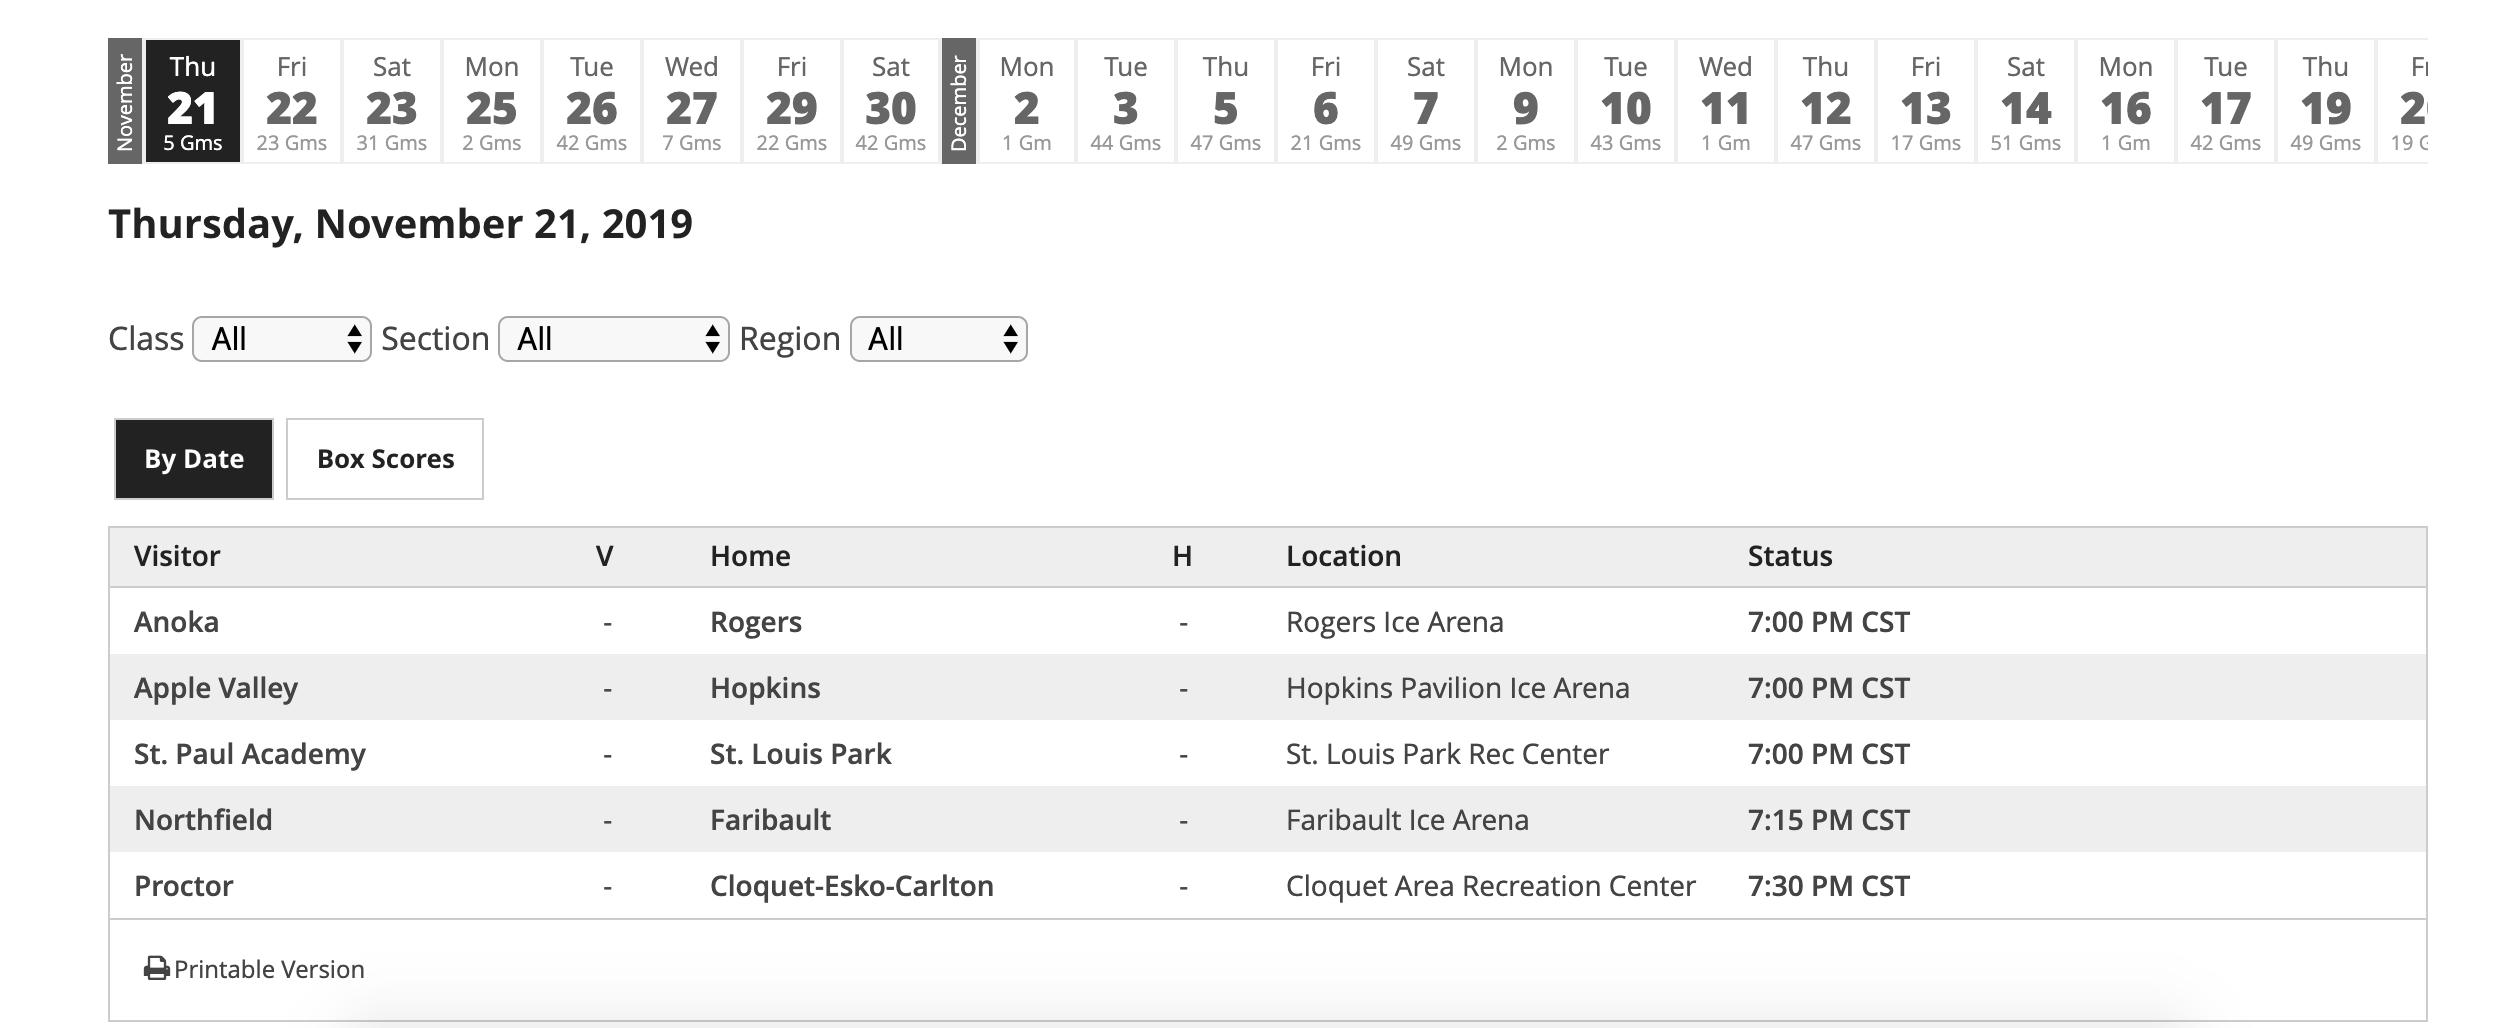 Grand Rapids Public School Calendar | Printable Calendar with regard to University Of Minnesota School Calendar 2021